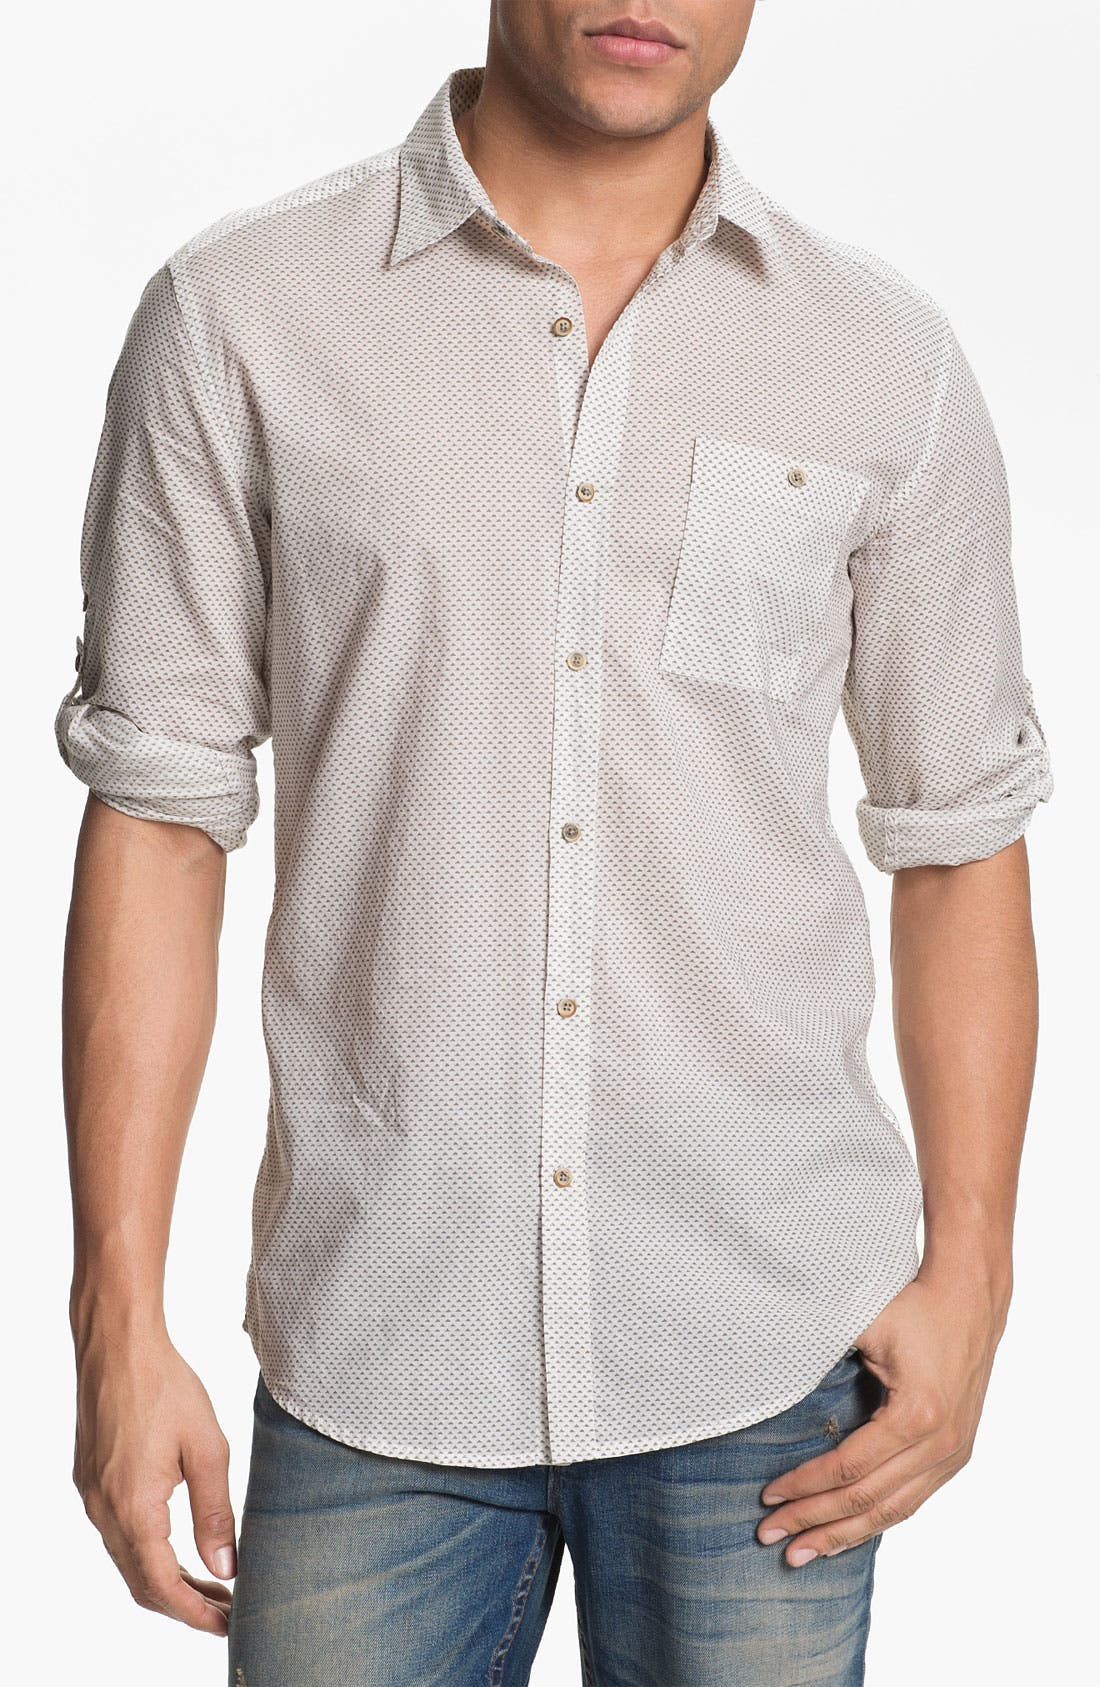 Alternate Image 1 Selected - Antony Morato Woven Shirt